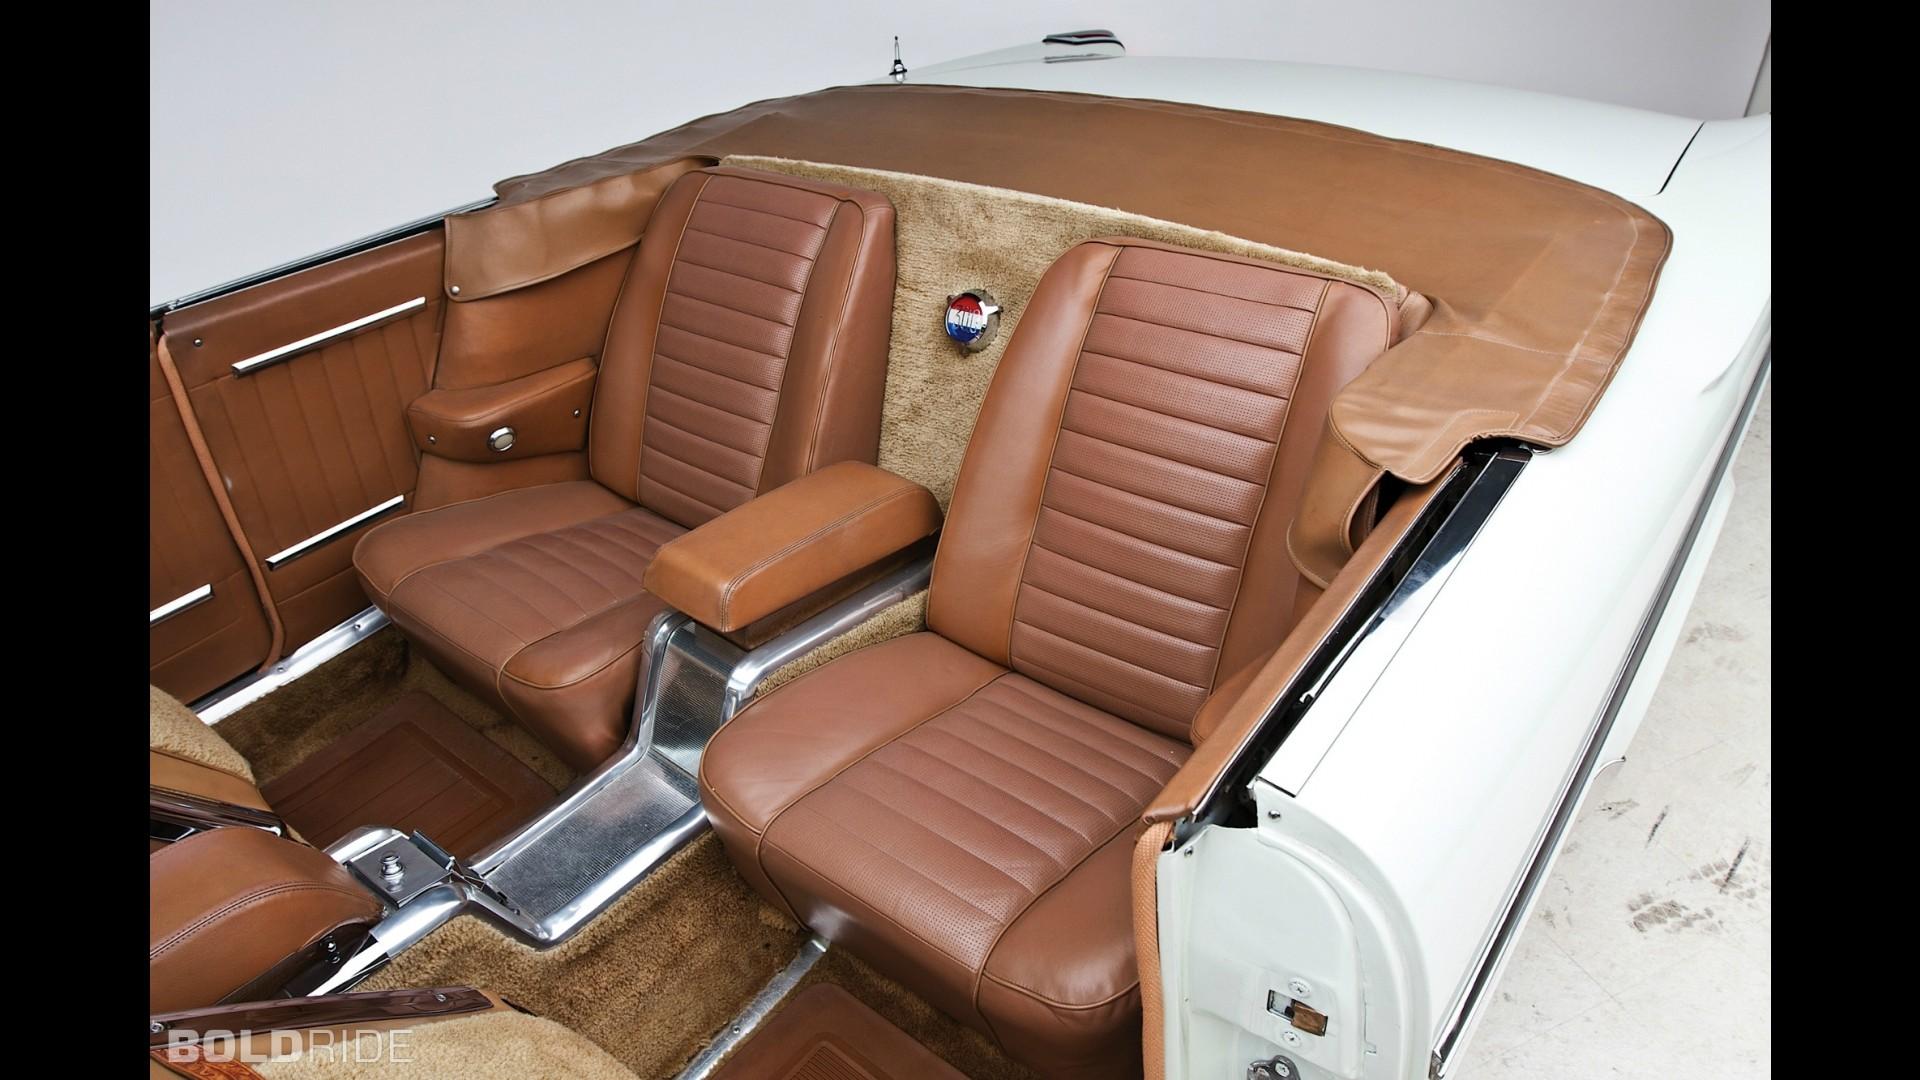 Mercedes-Benz GLK350 Edition 1